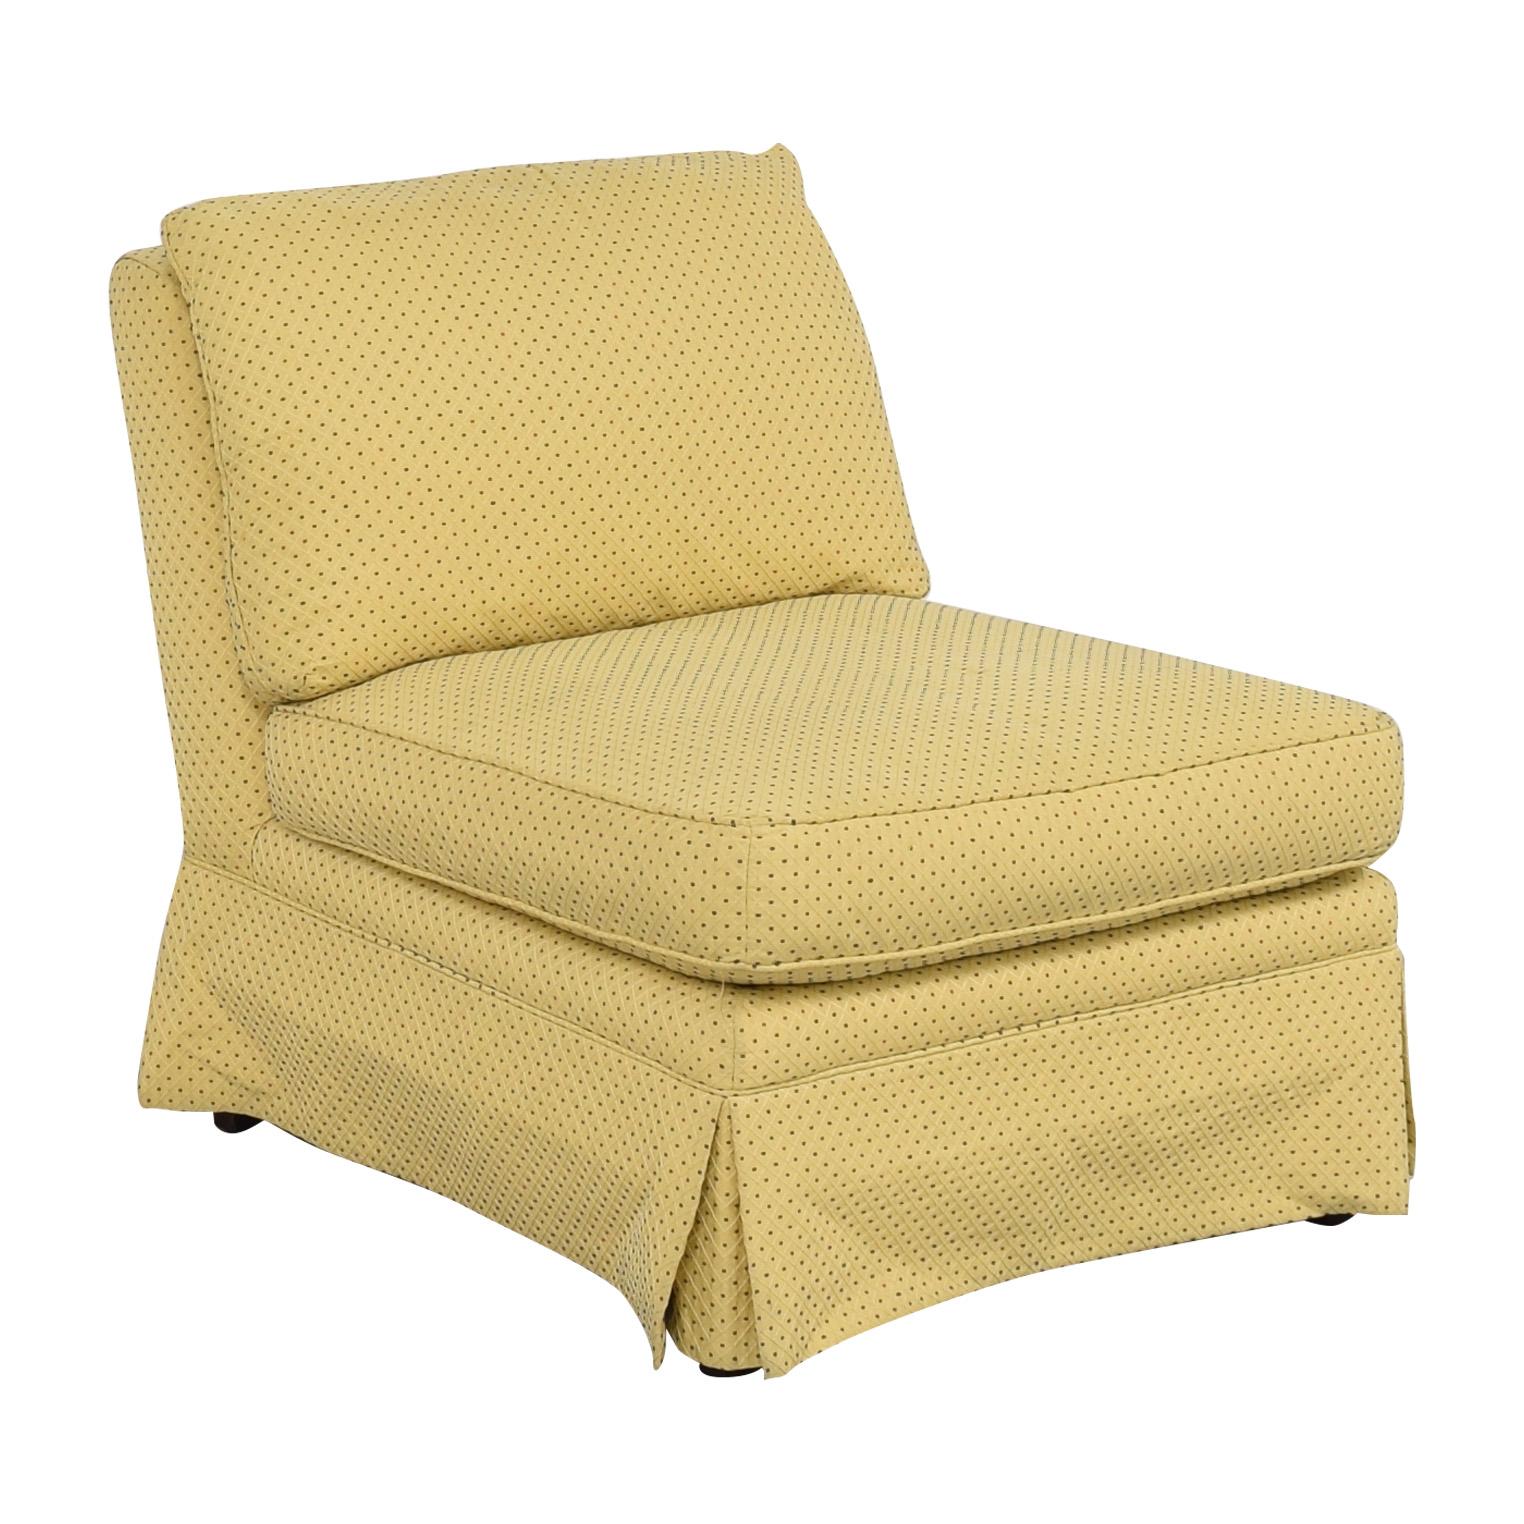 Sherrill Furniture Sherrill Furniture Upholstered Chair on sale